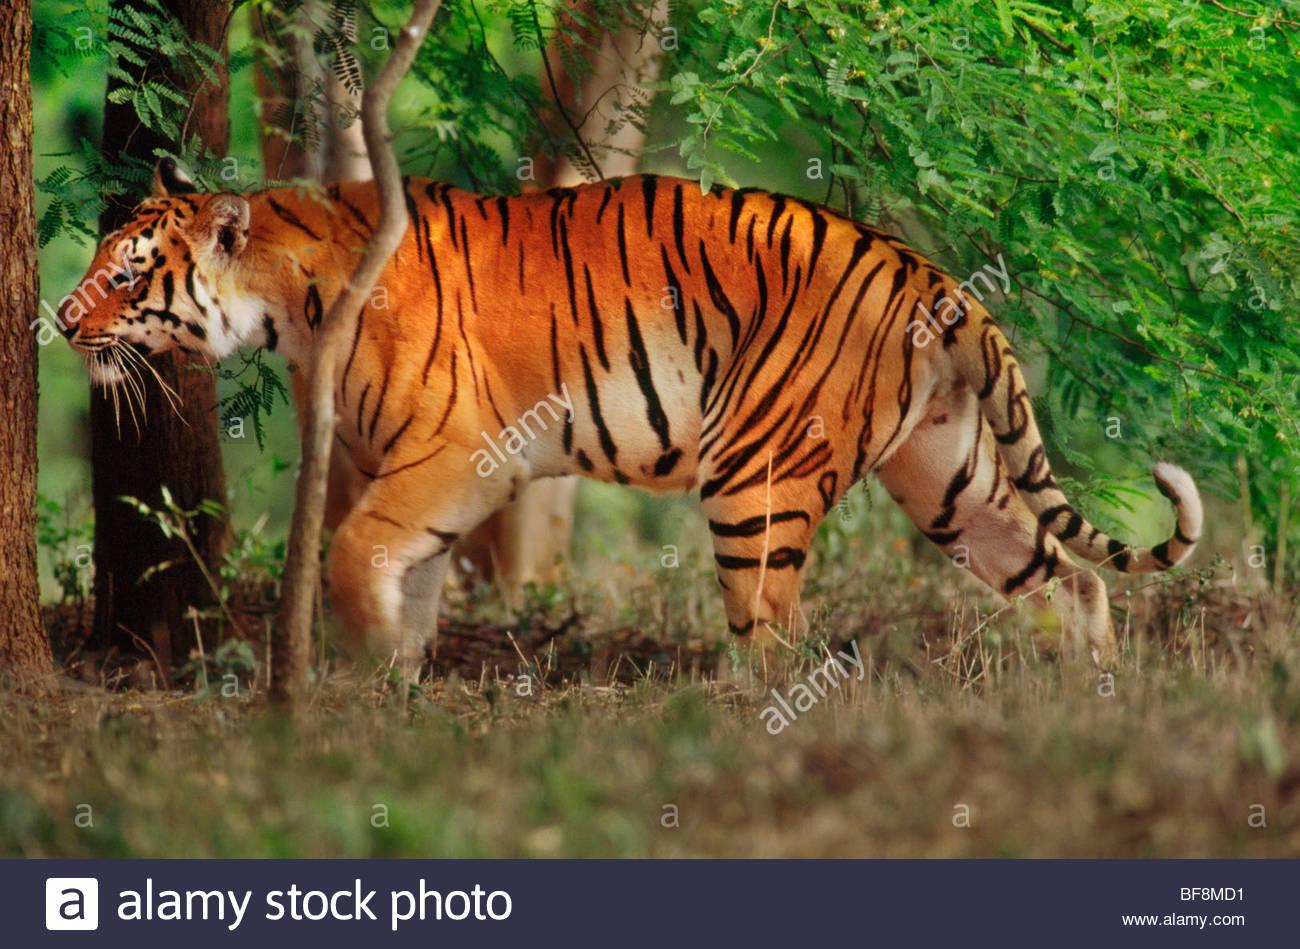 Bengal tiger prowling, Panthera tigris tigris, Western Ghats, India - Stock Image